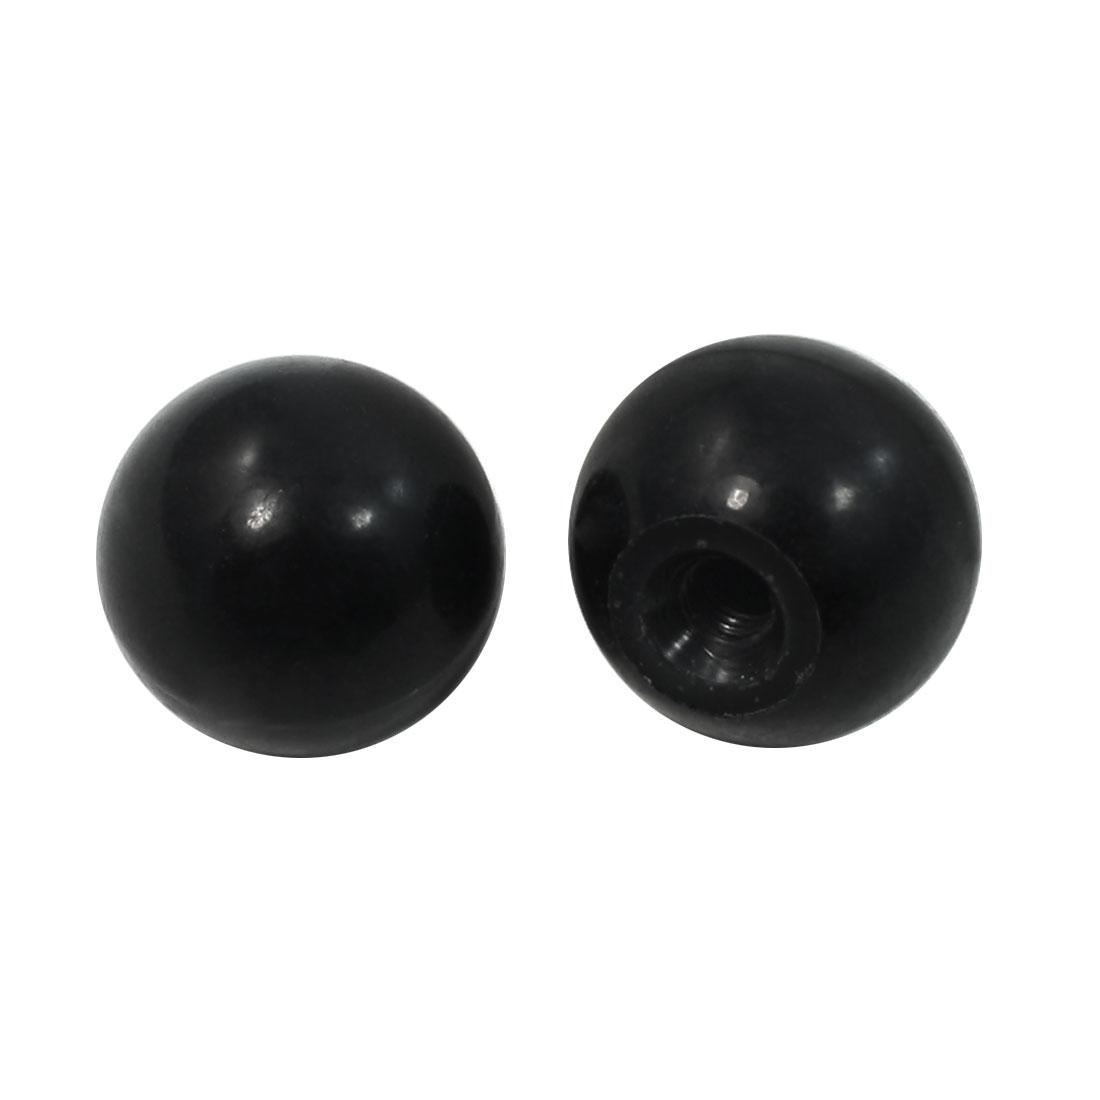 "2 Pcs 15/64"" Thread Hole 25mm Diameter Tapped Handling Ball Knobs Black"